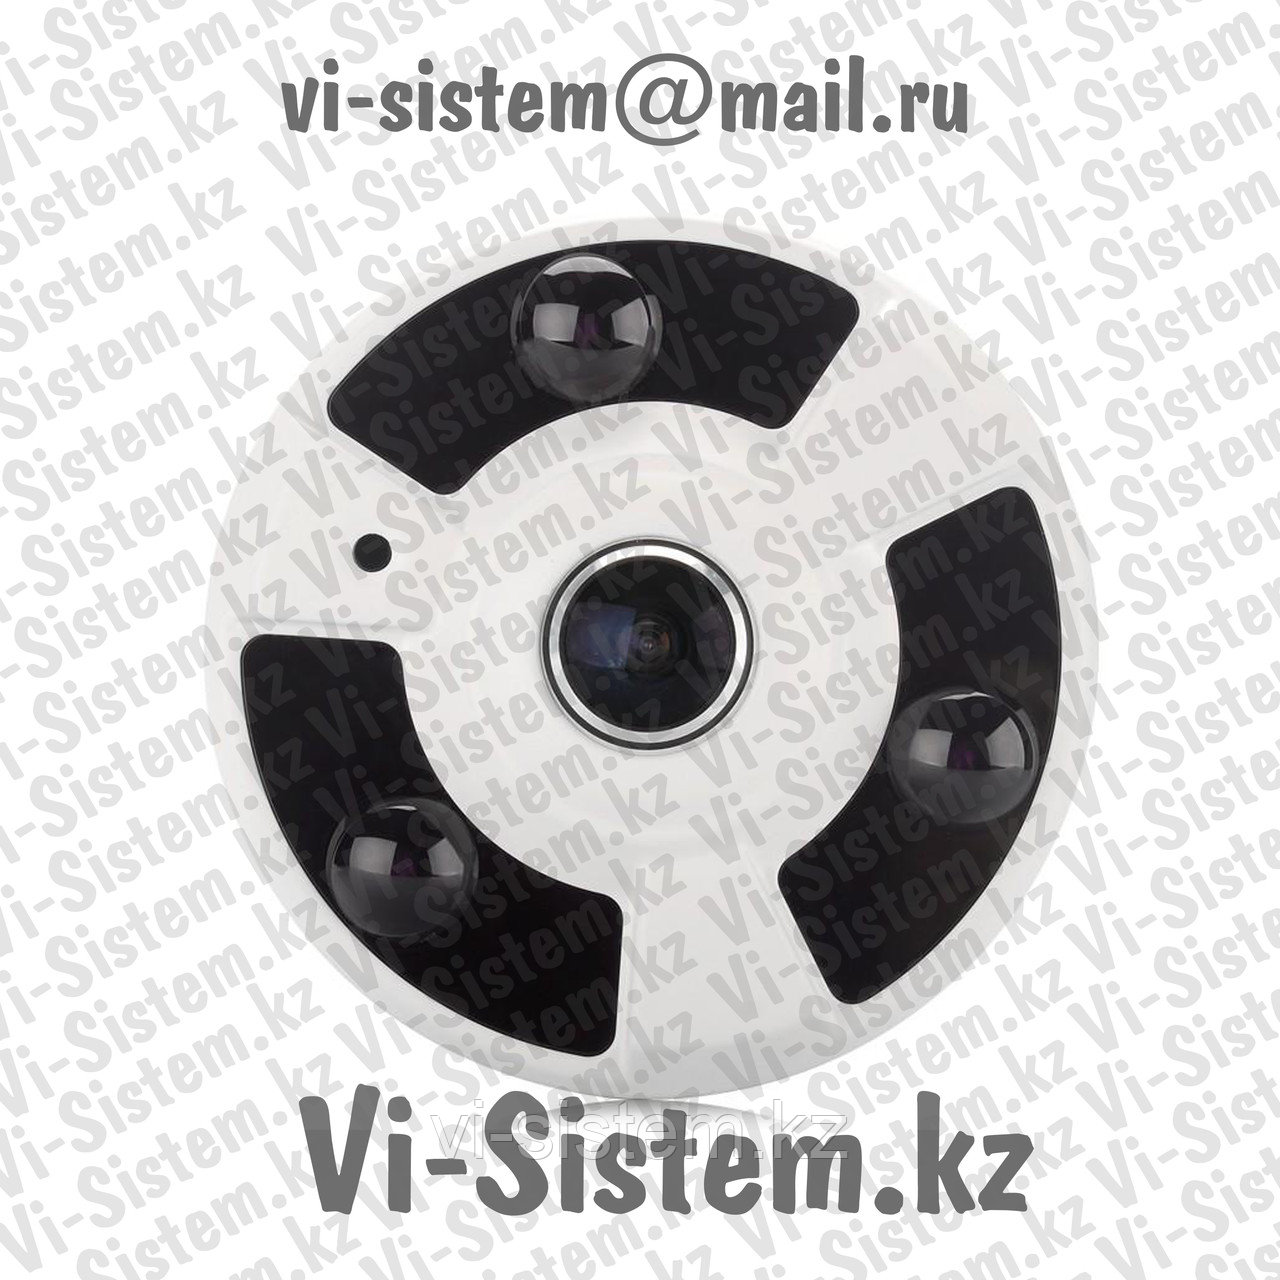 IP-Видеокамера SYNCAR SY-002 2MP Рыбий глаз